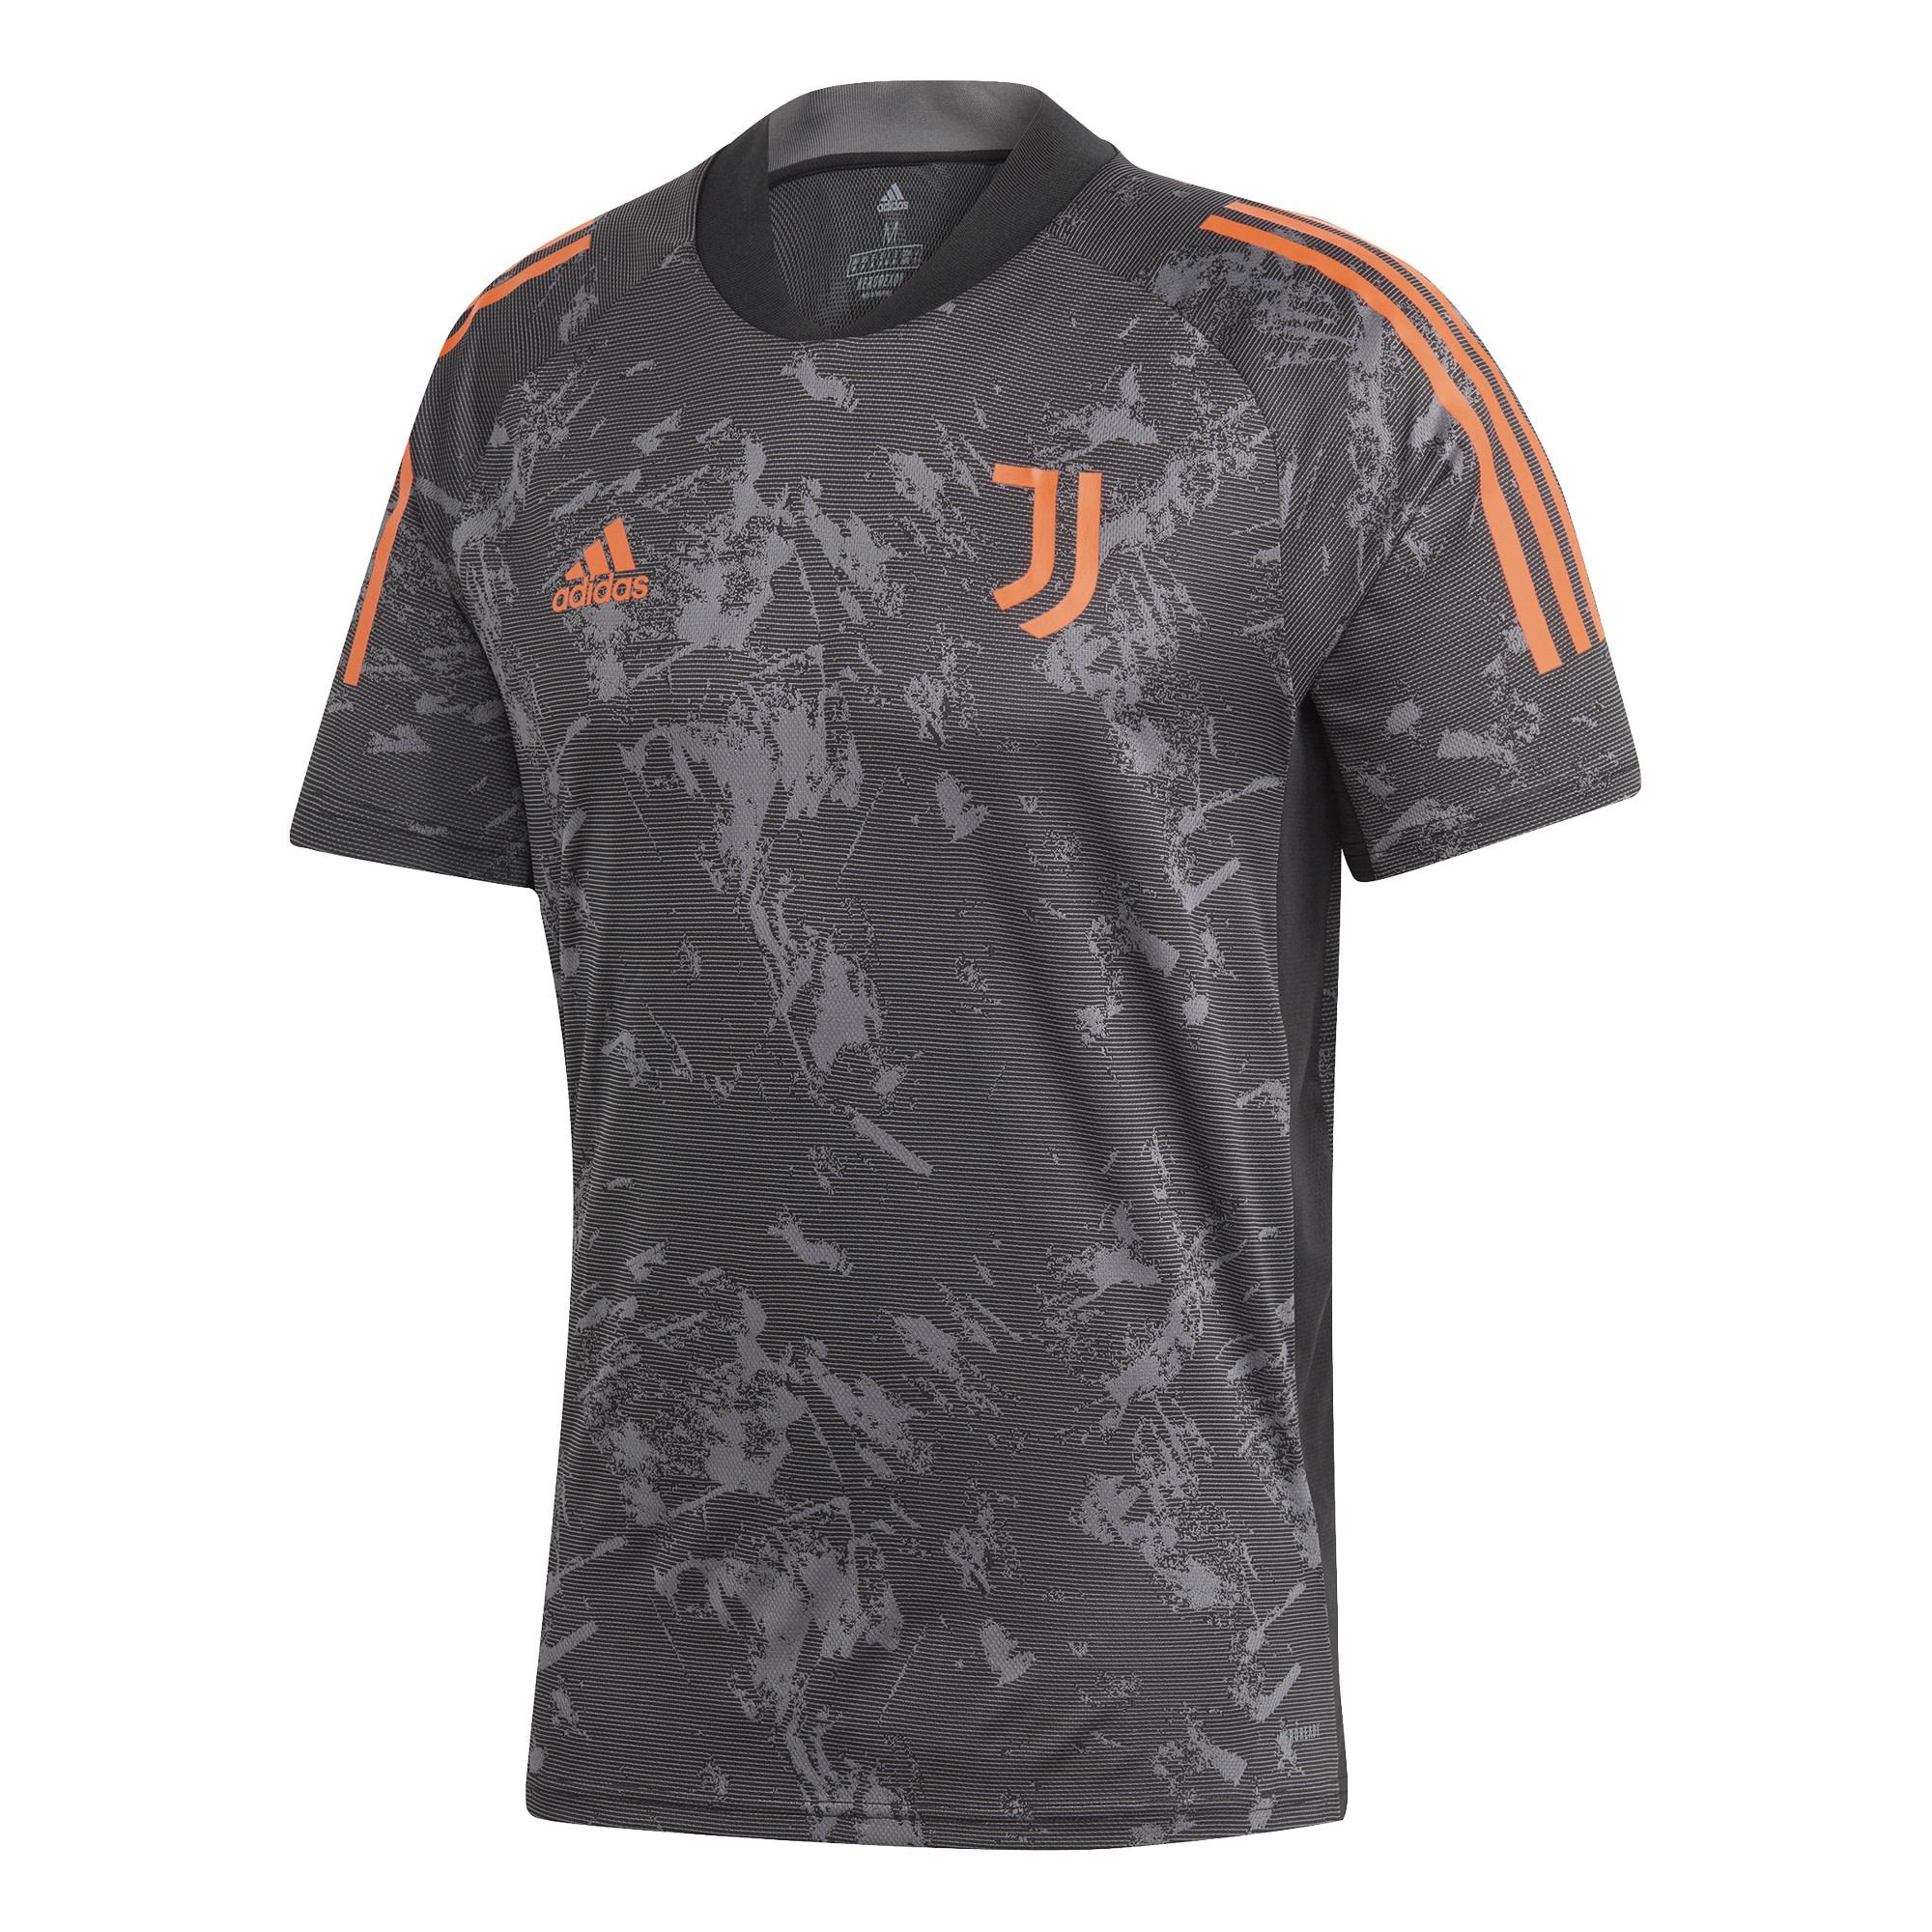 Adidas ADIDAS Juventus EU Training Jersey